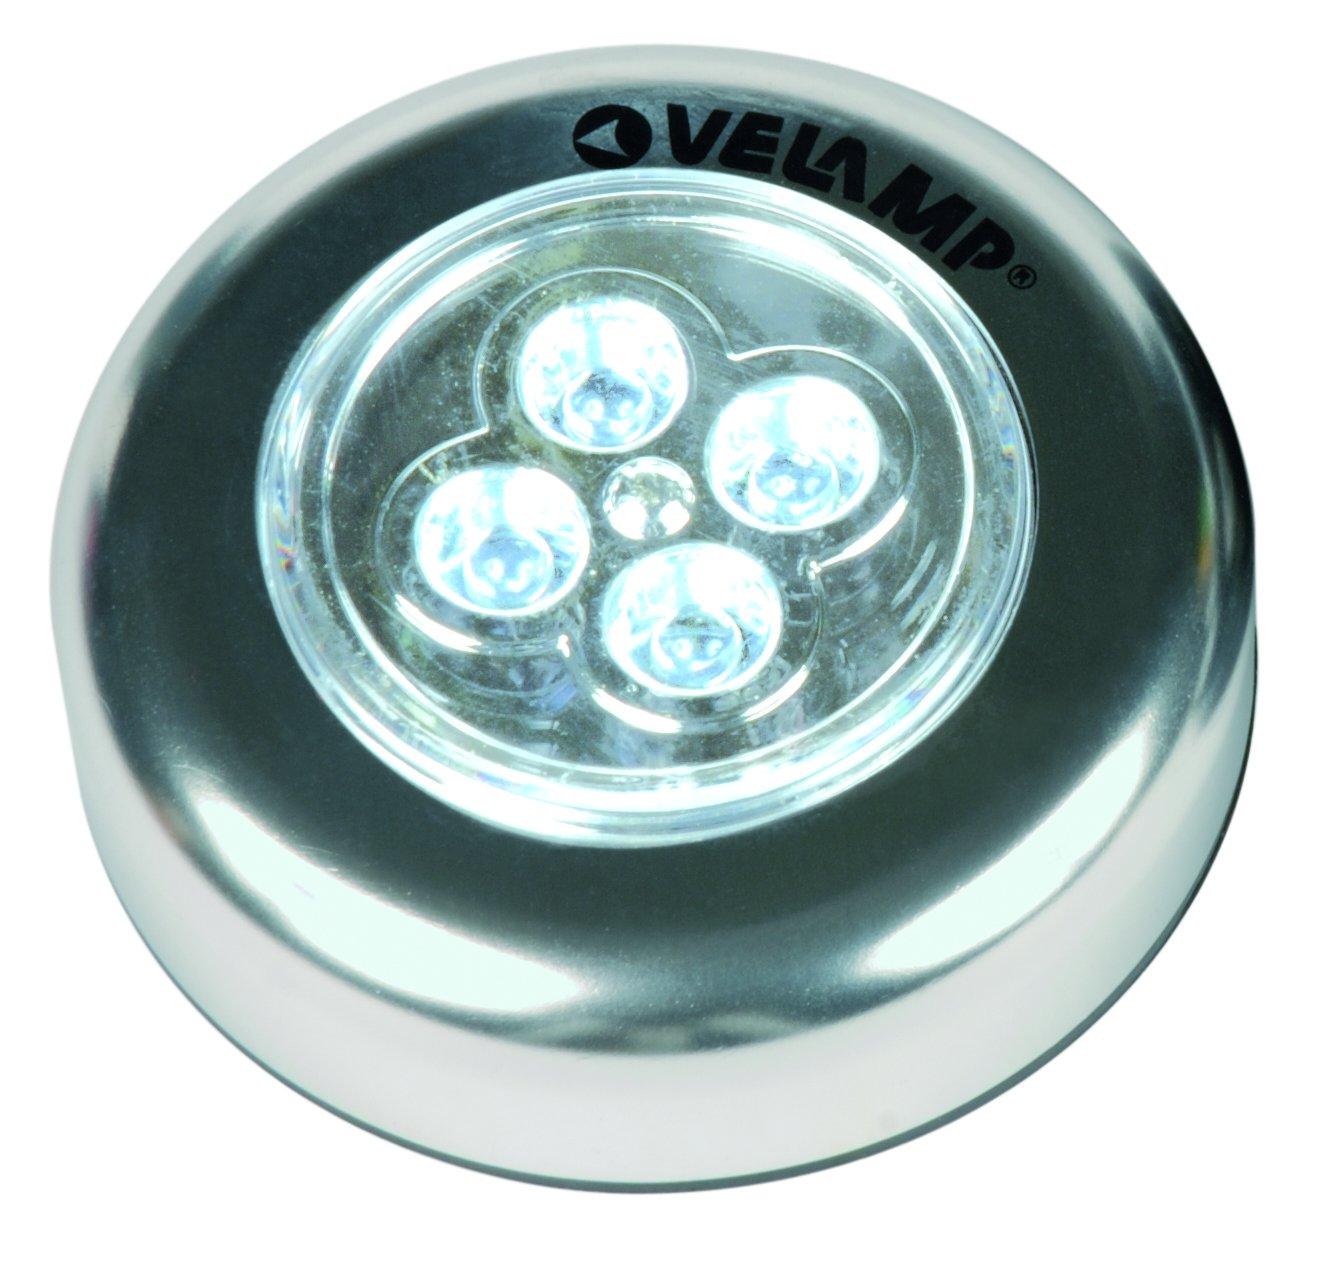 3 LED Velamp IL12 Mini Push Light in Alluminio